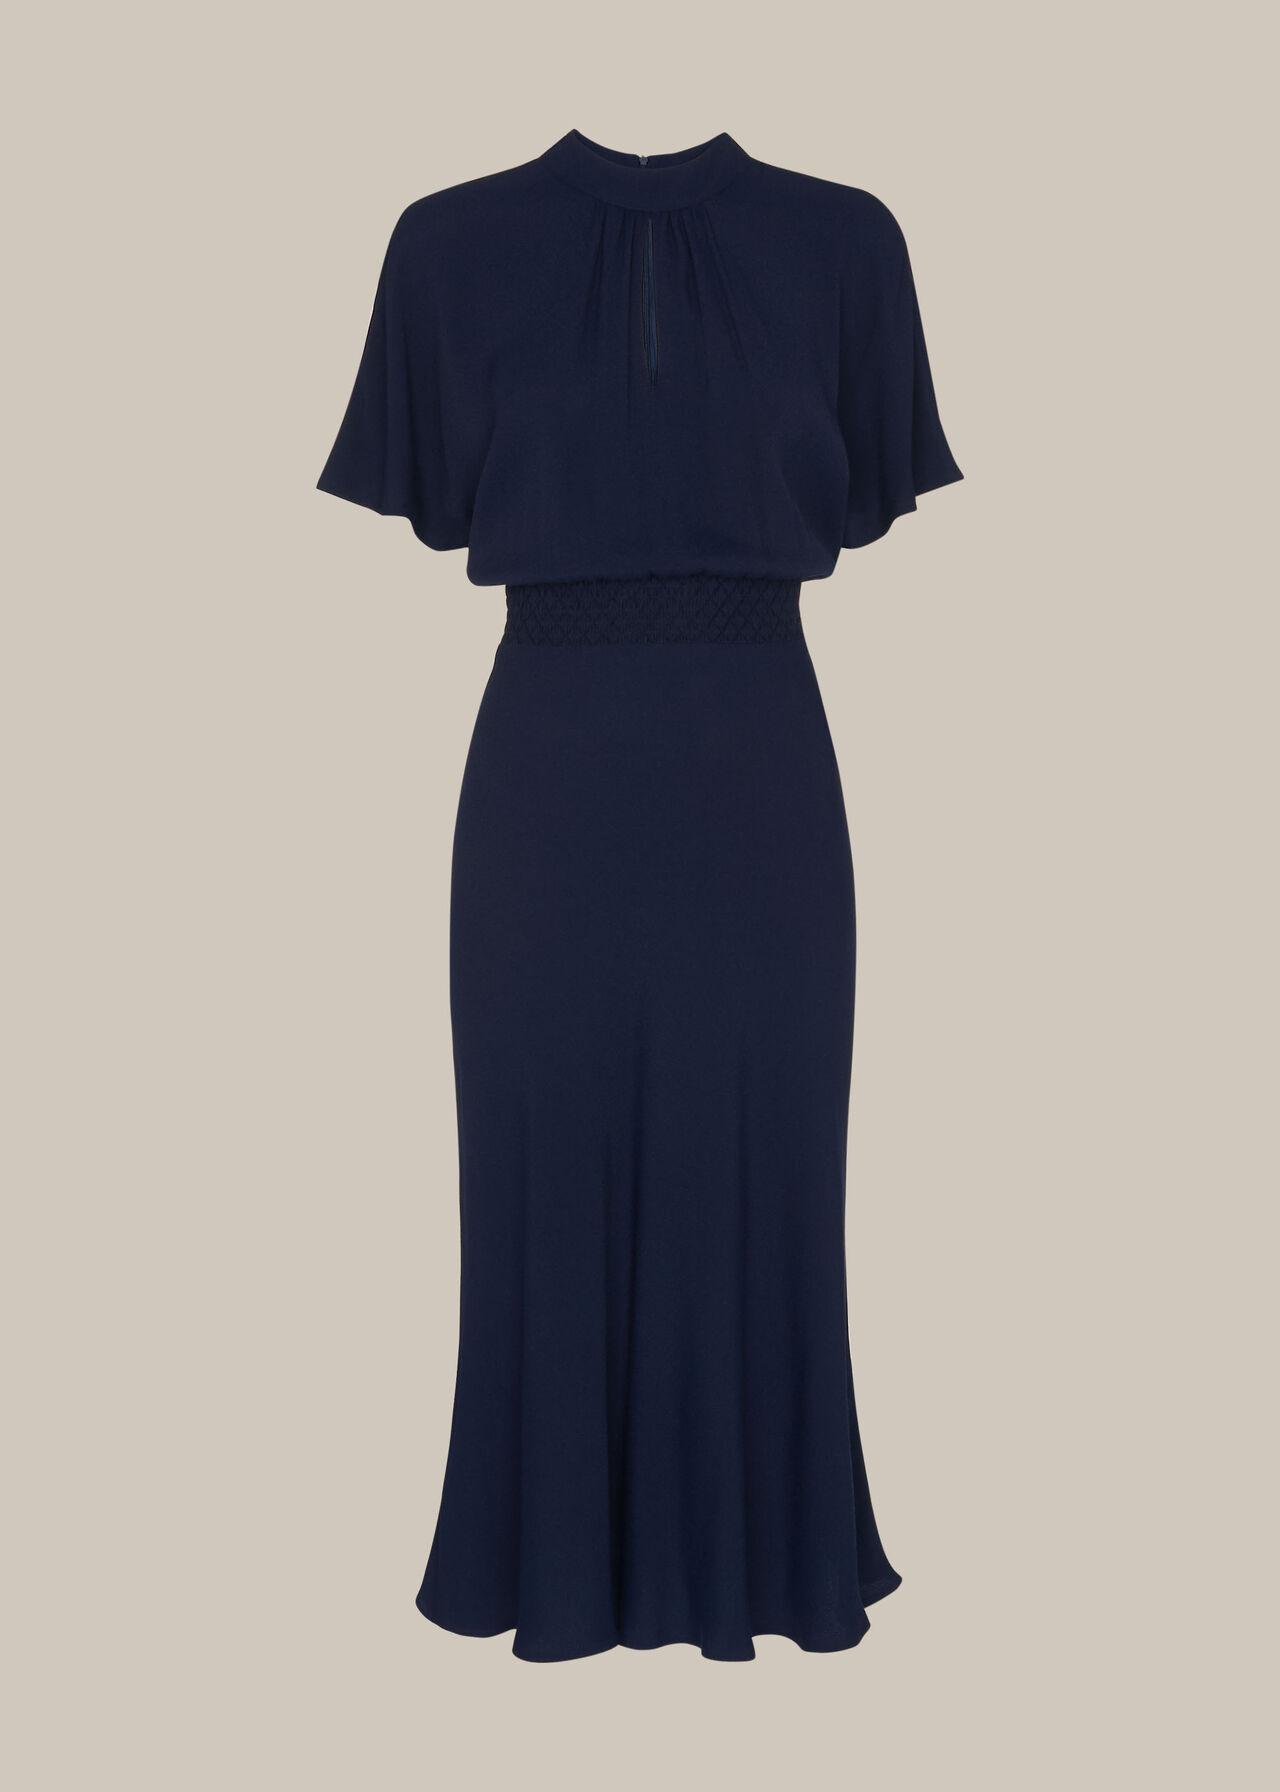 Shirred Waist Midi Dress Navy